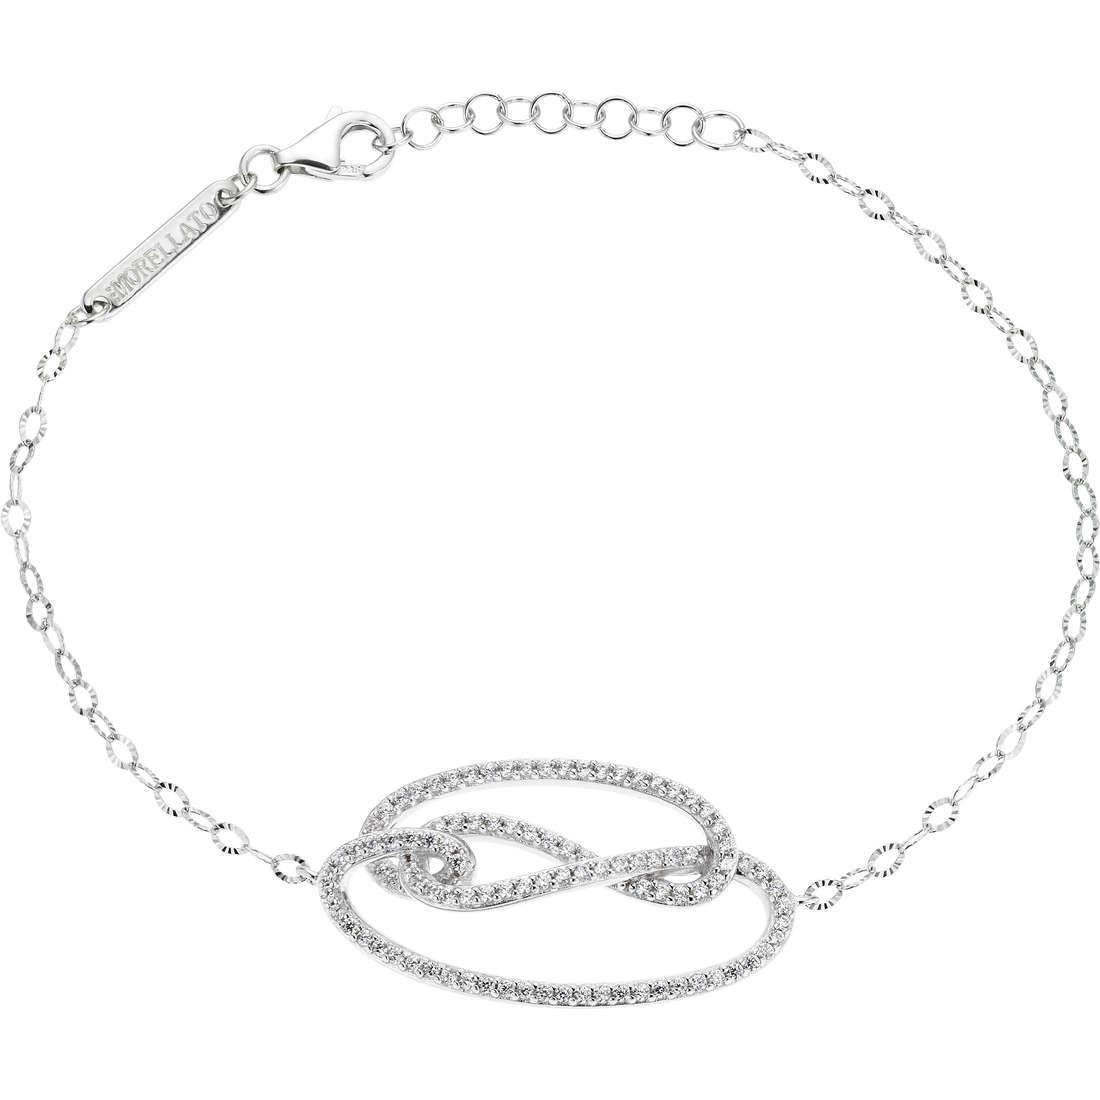 bracelet woman jewellery Morellato 1930 Michelle Hunziker SAHA08